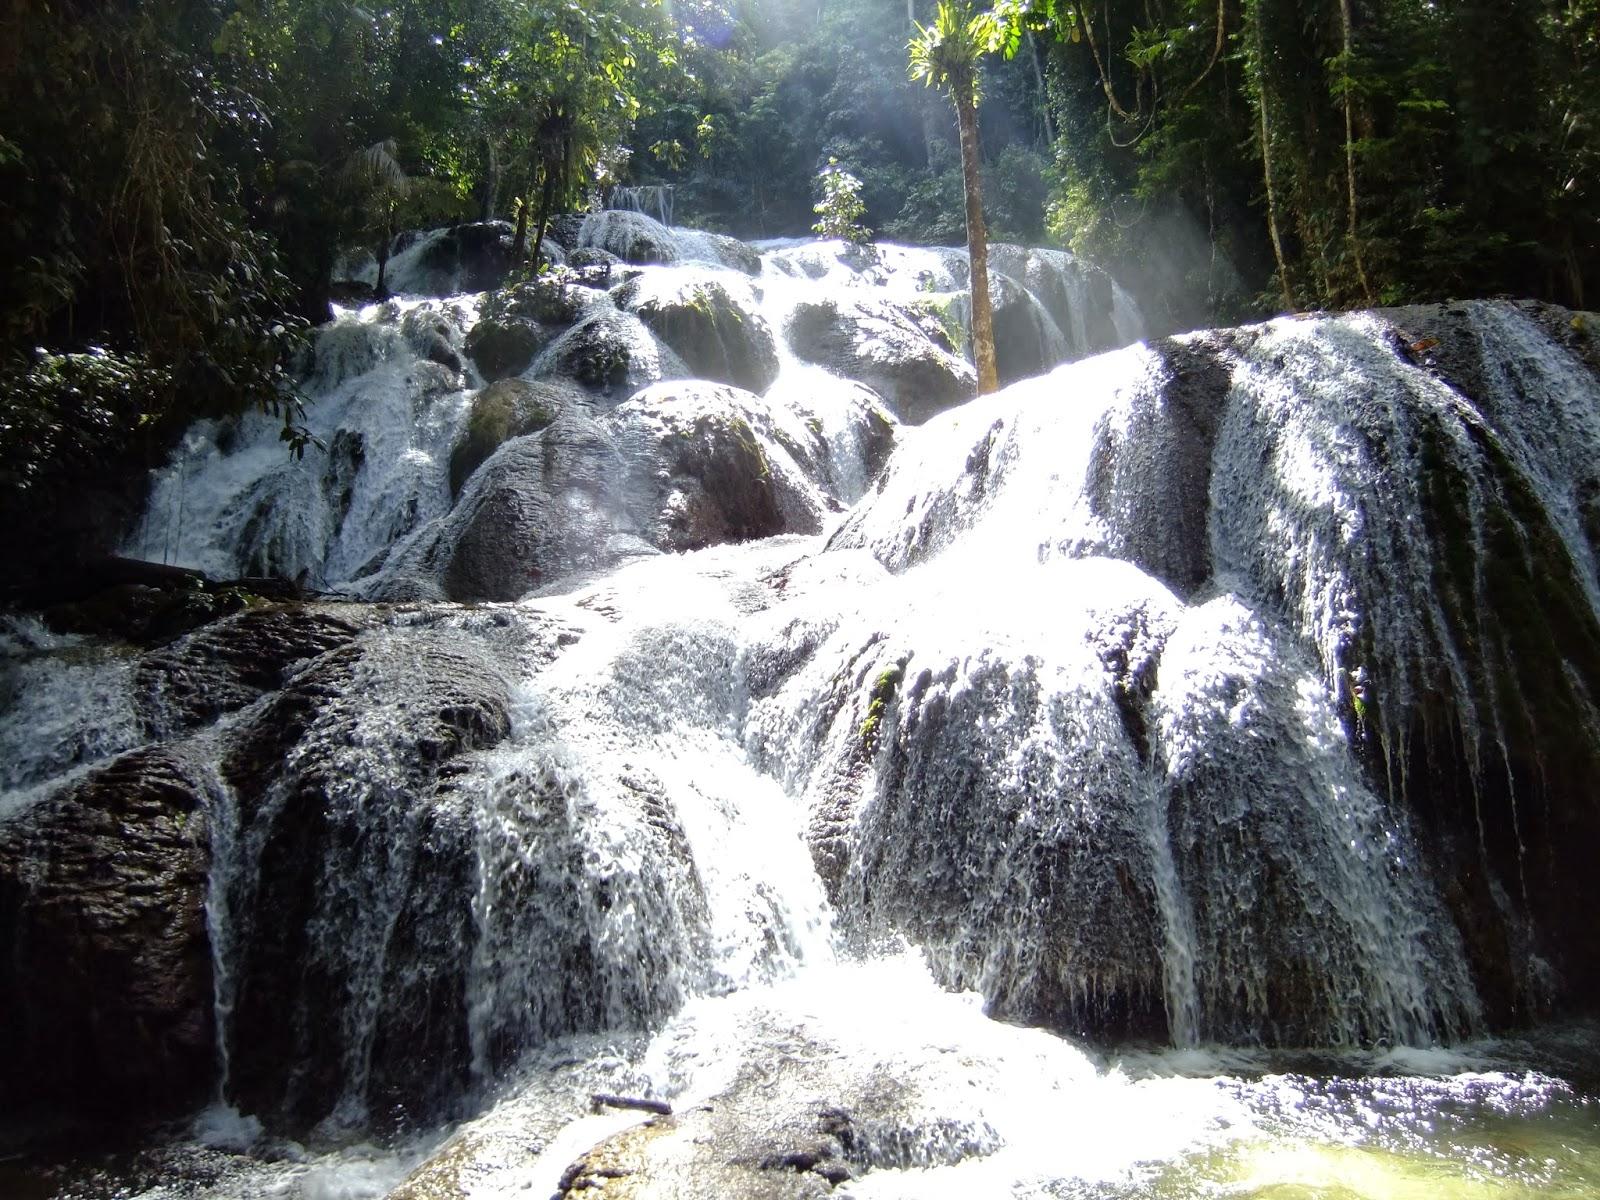 Saluopa Waterfall in Central Sulawesi